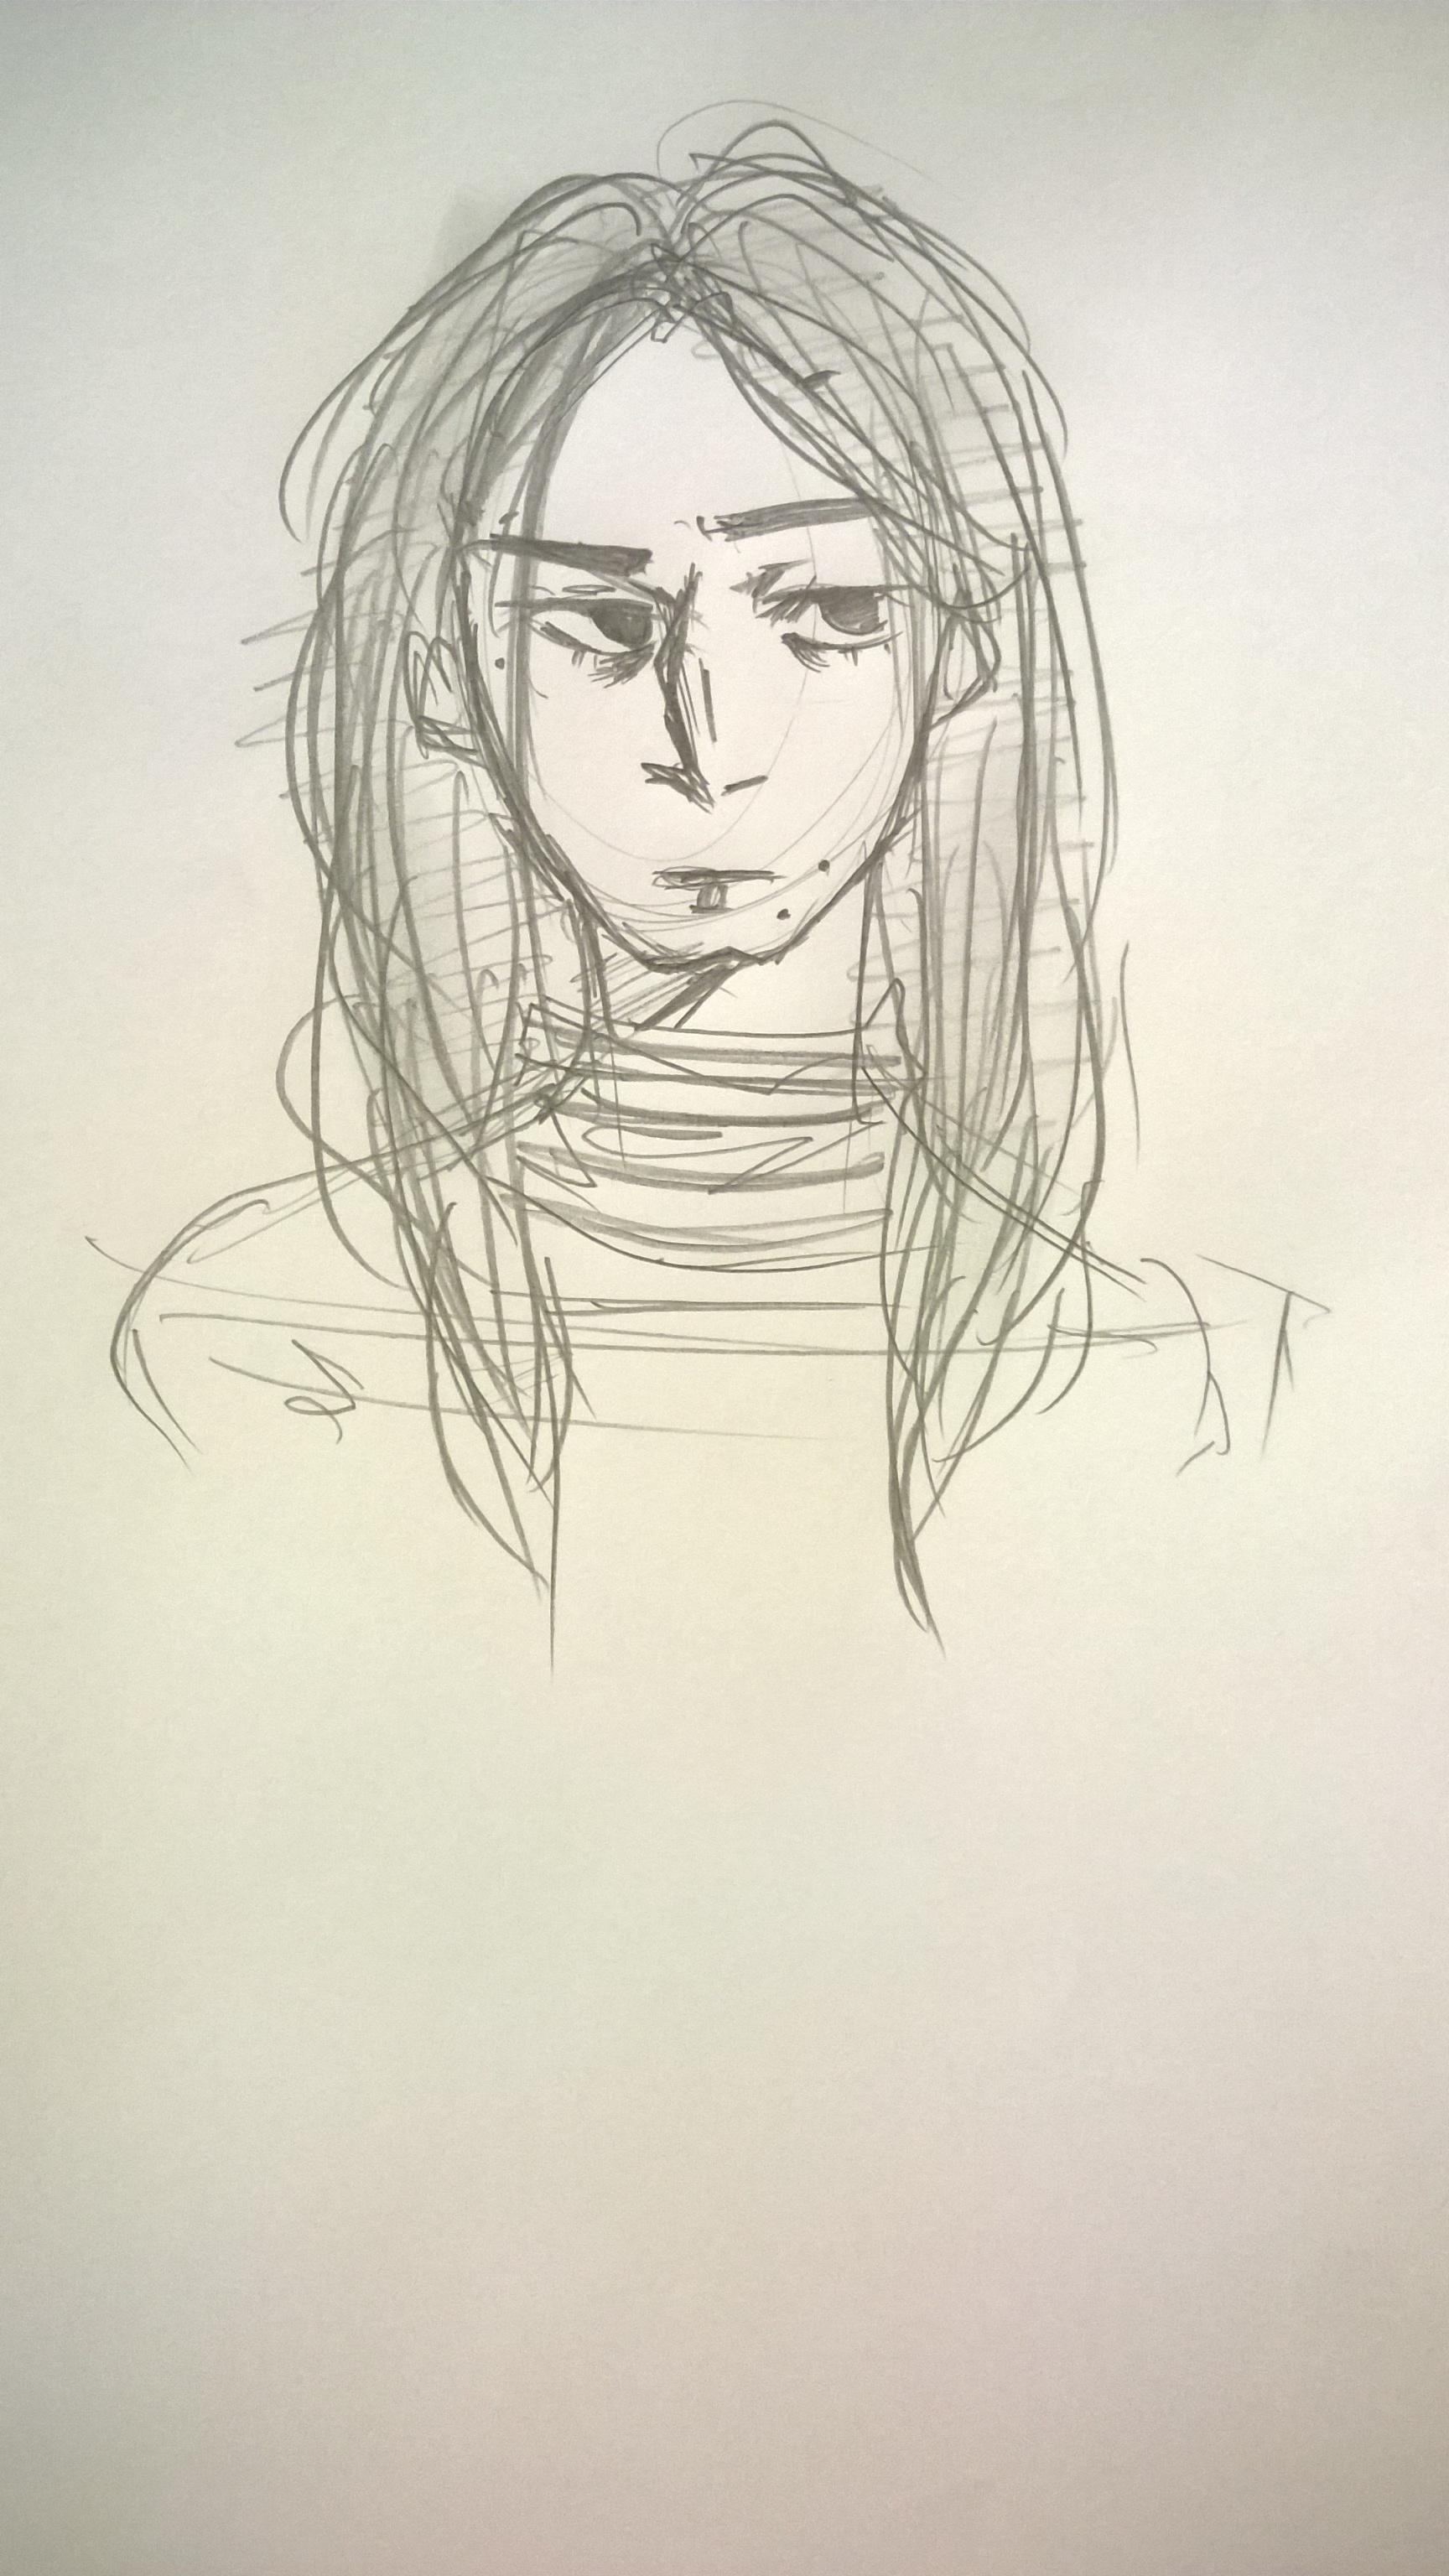 TrashcanDad's Profile Picture